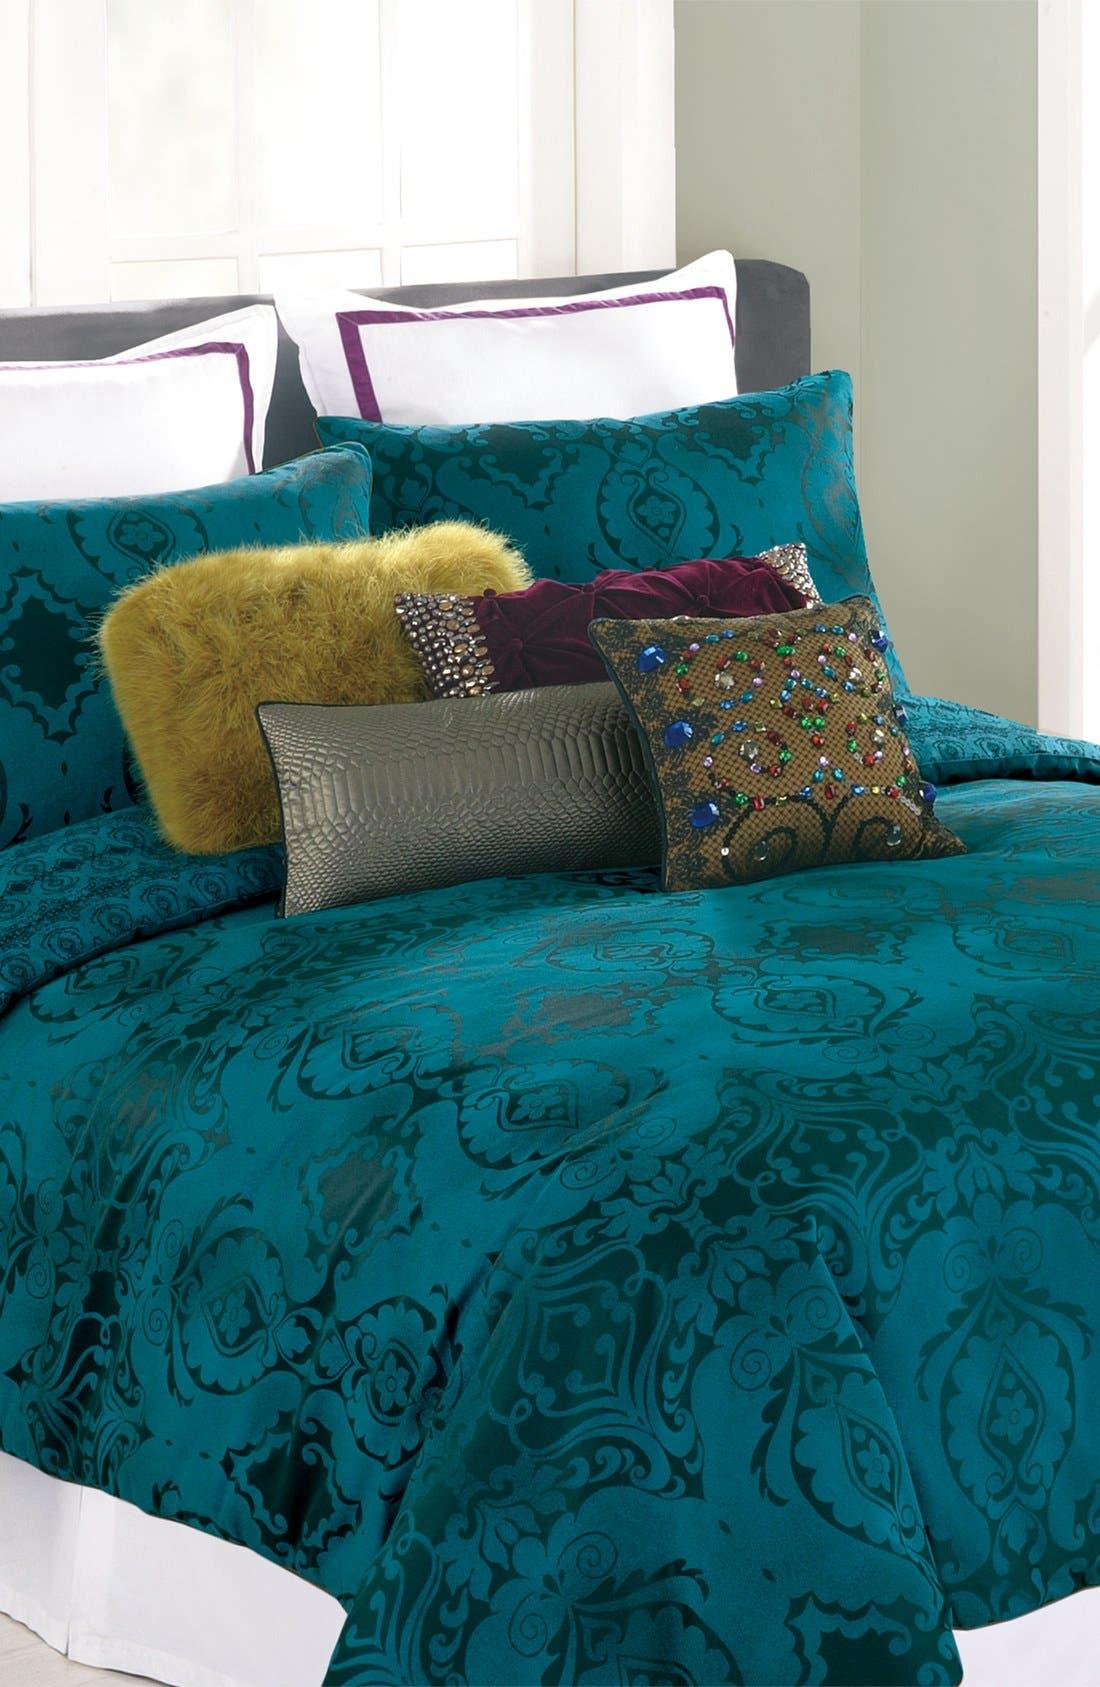 Alternate Image 1 Selected - Nanette Lepore Villa 'Baroque' Comforter & Shams